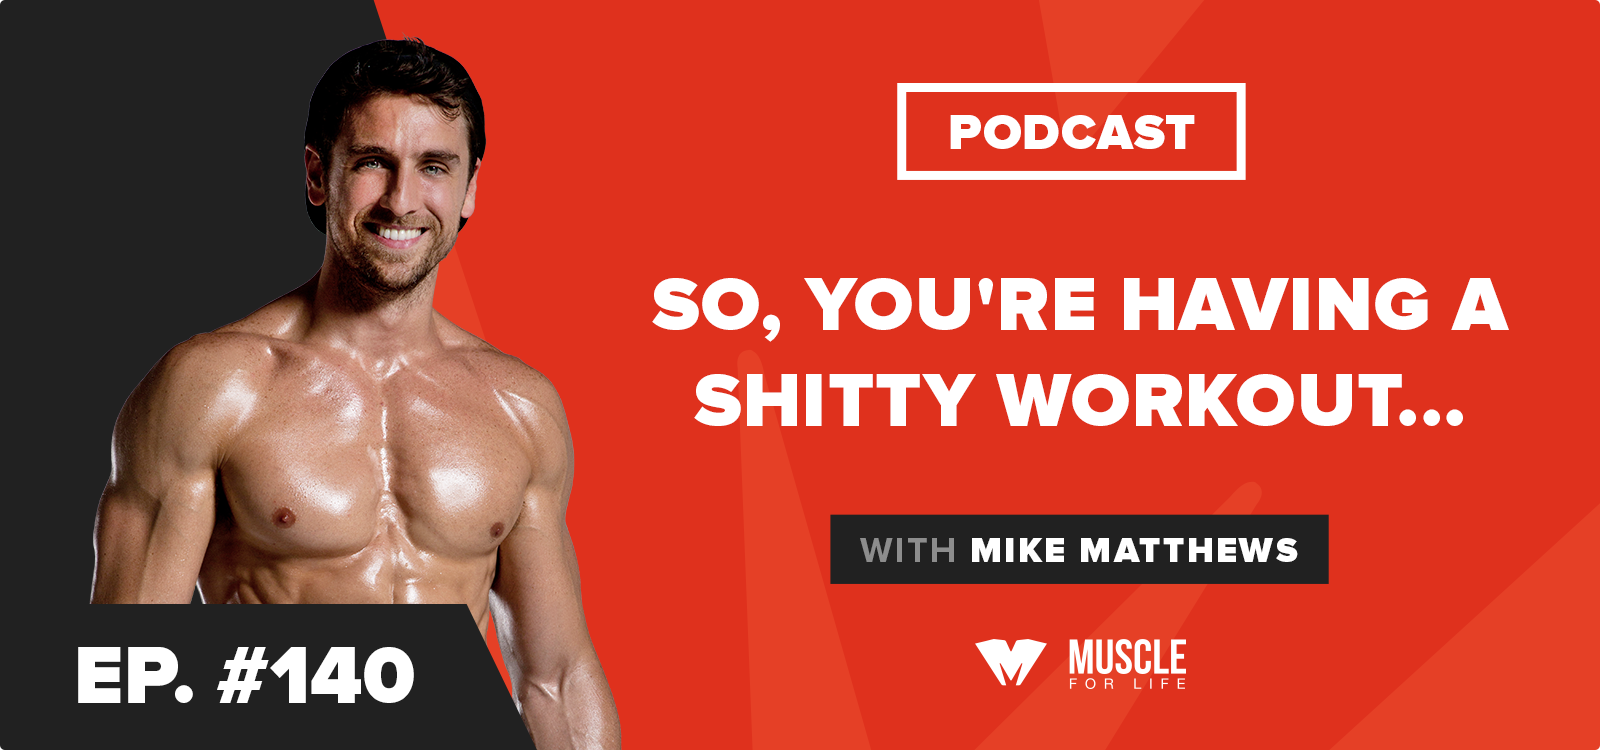 Motivation Monday: So, You're Having a Shitty Workout…